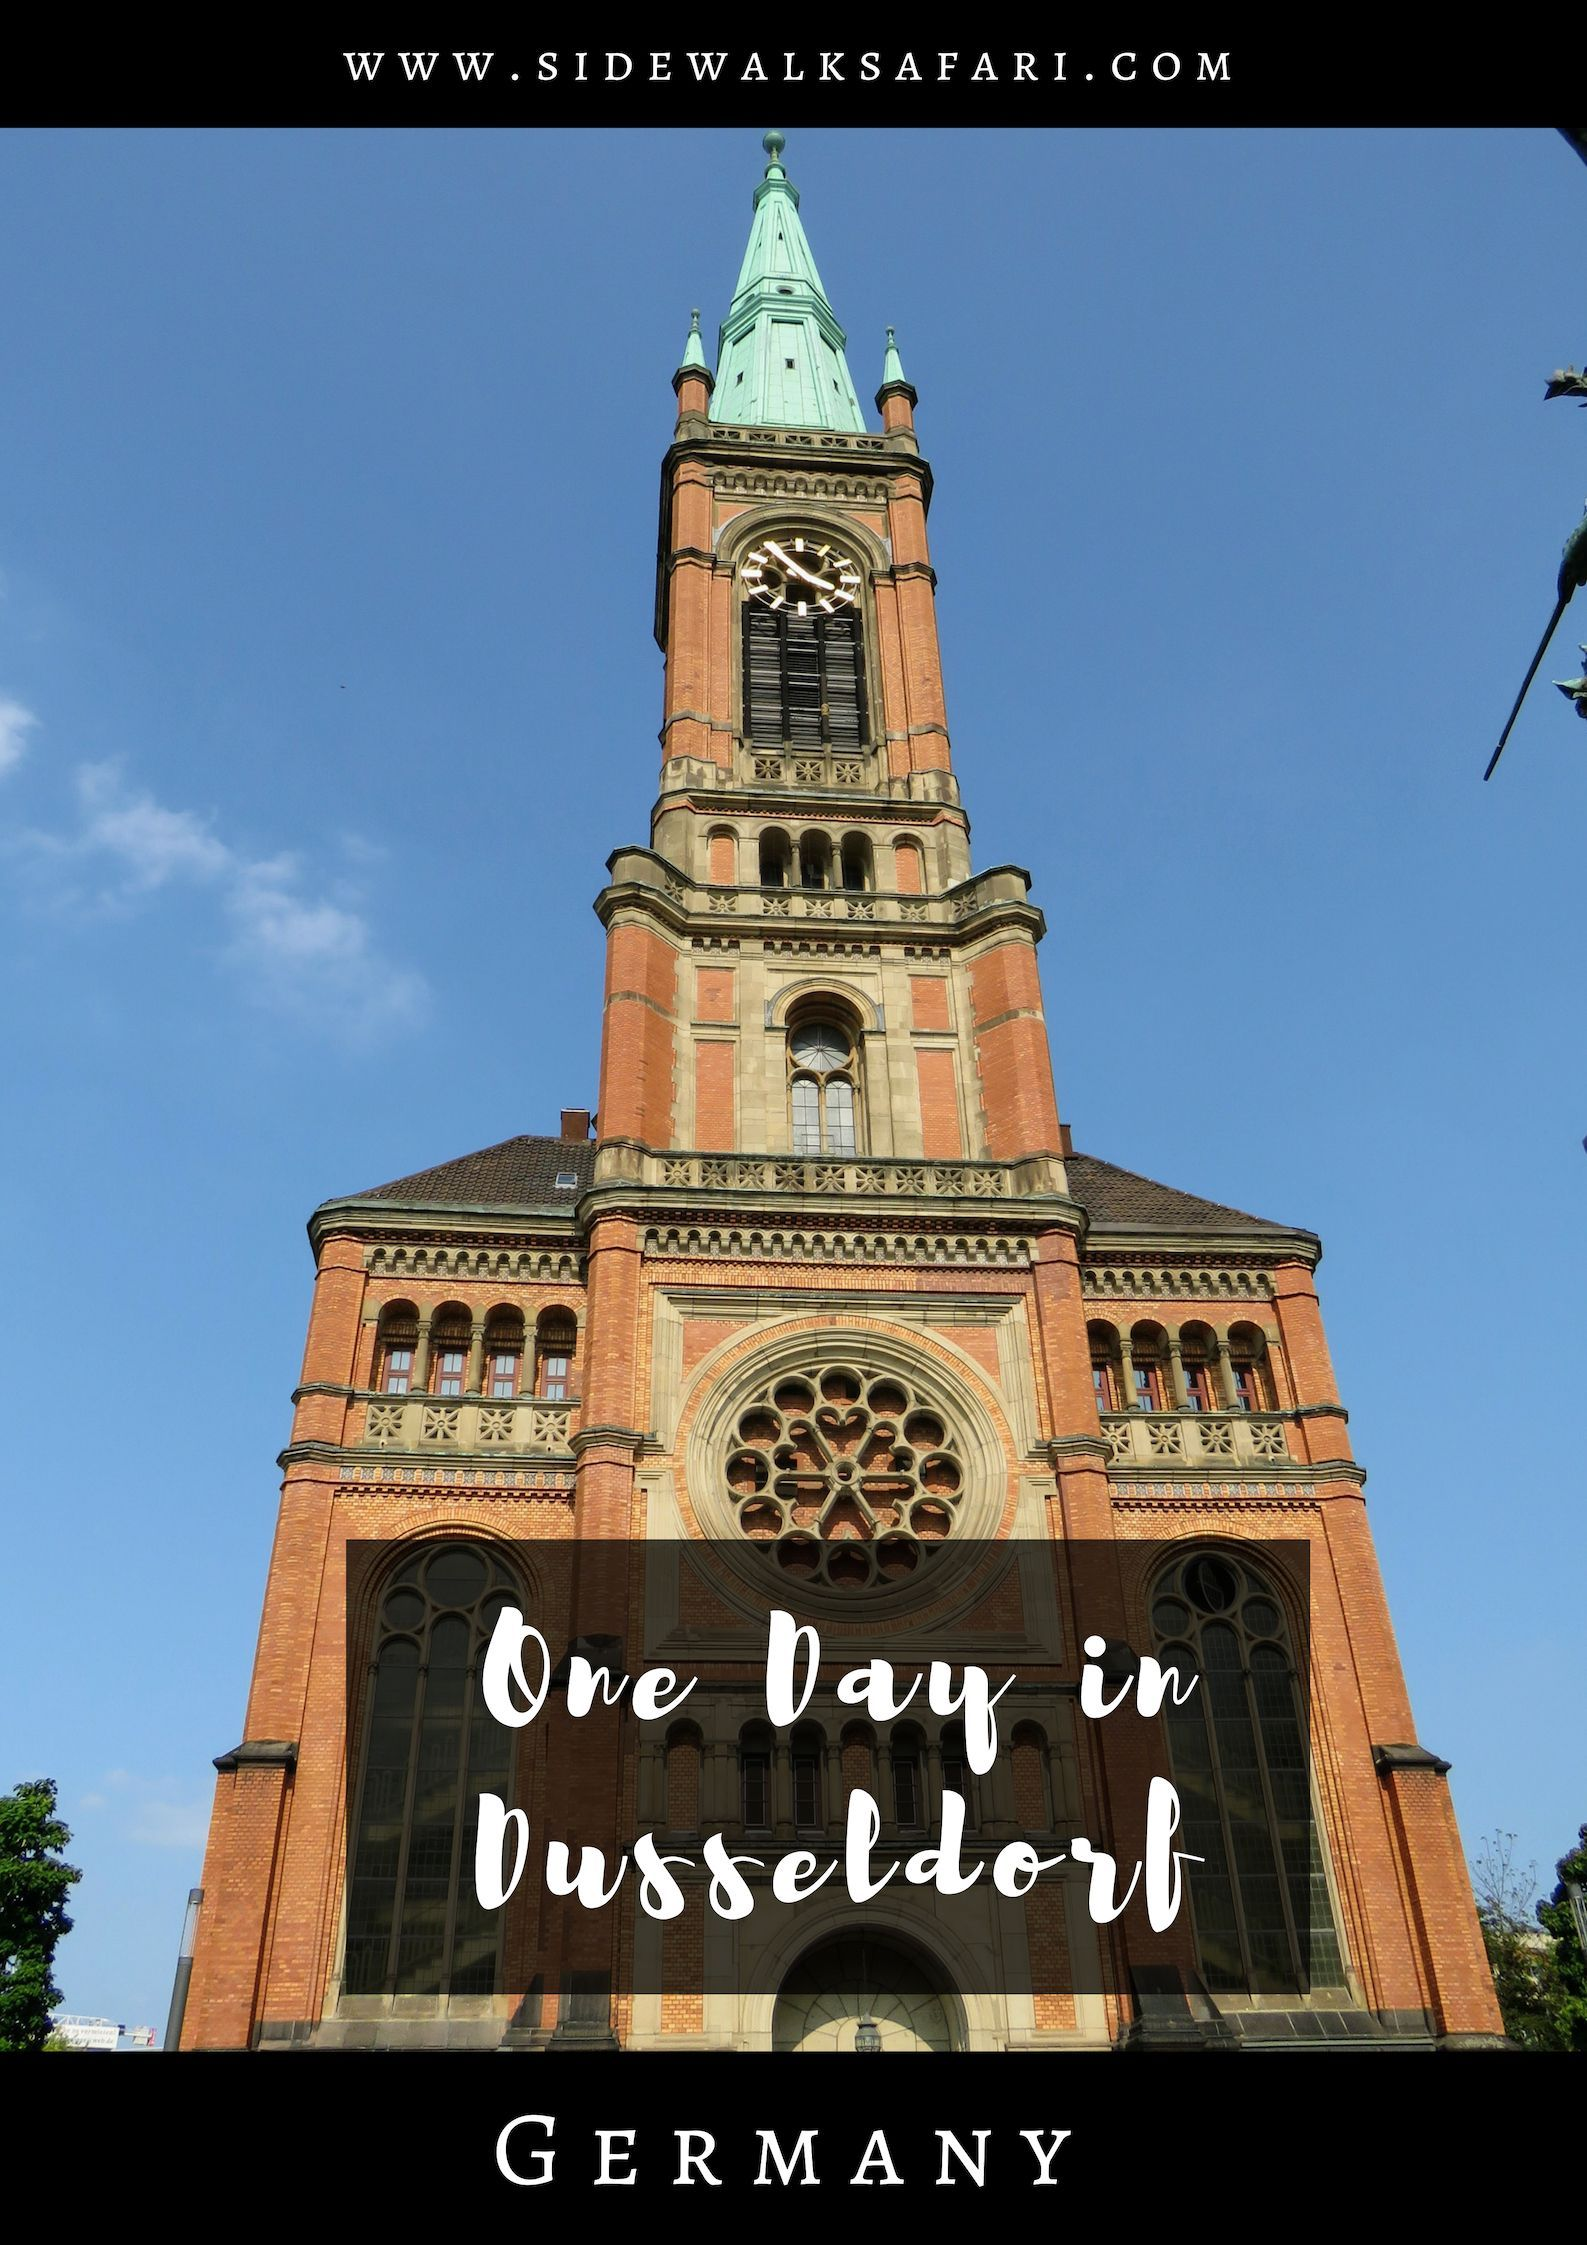 One Day in Düsseldorf Germany | Sidewalk Safari Travel Blog Posts Dusseldorf Old Town Map on